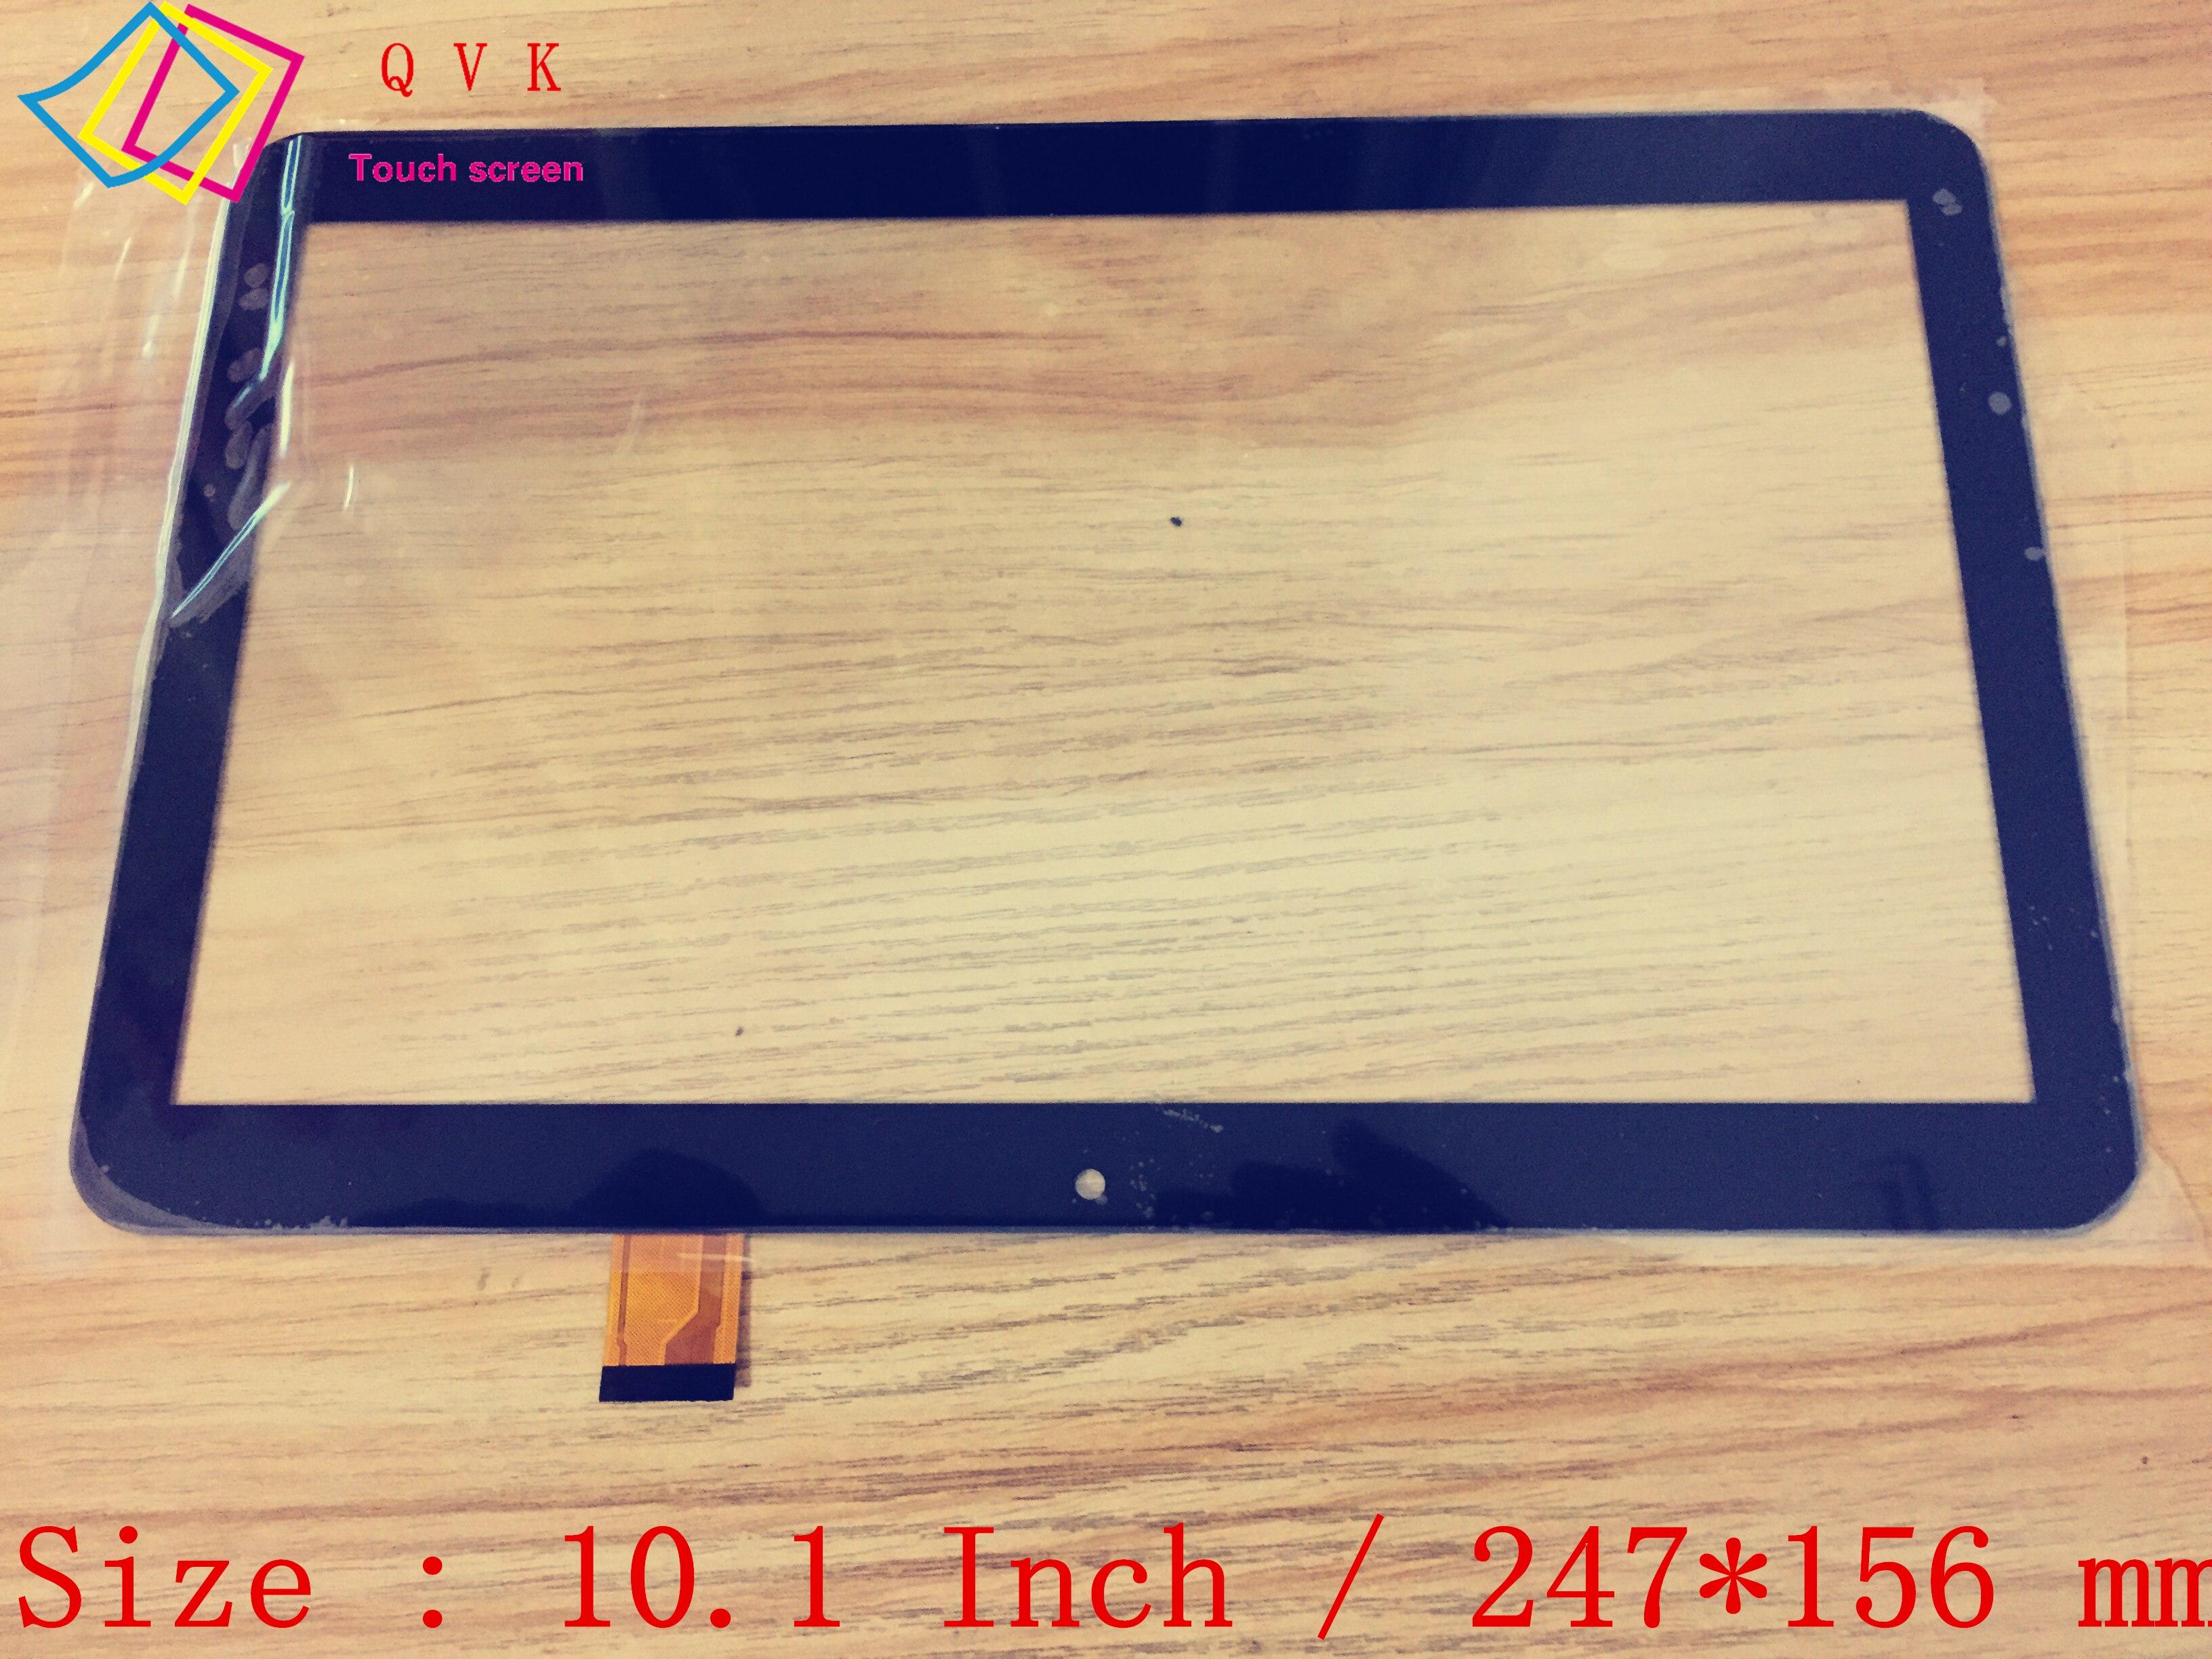 Panel digitalizador de cristal para tablet pc, pantalla táctil capacitiva, negro, 10,1 pulgadas, P/N DY10218(V2)